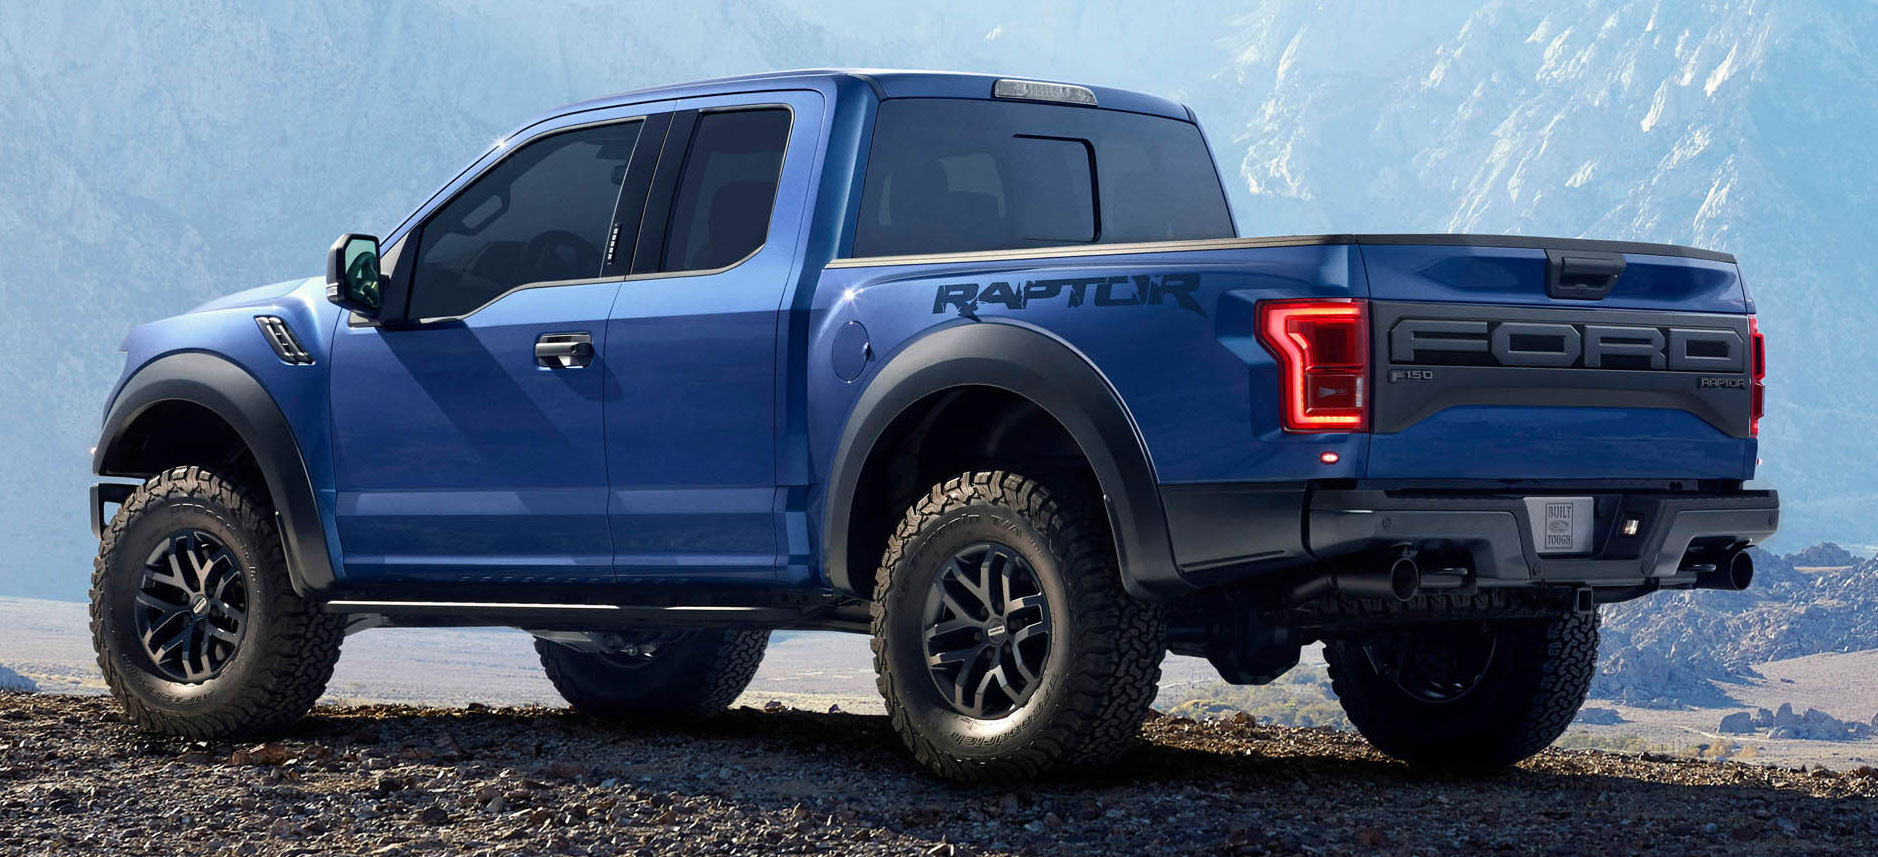 2016 Ford F 150 Raptor A High Performance Pickup Truck